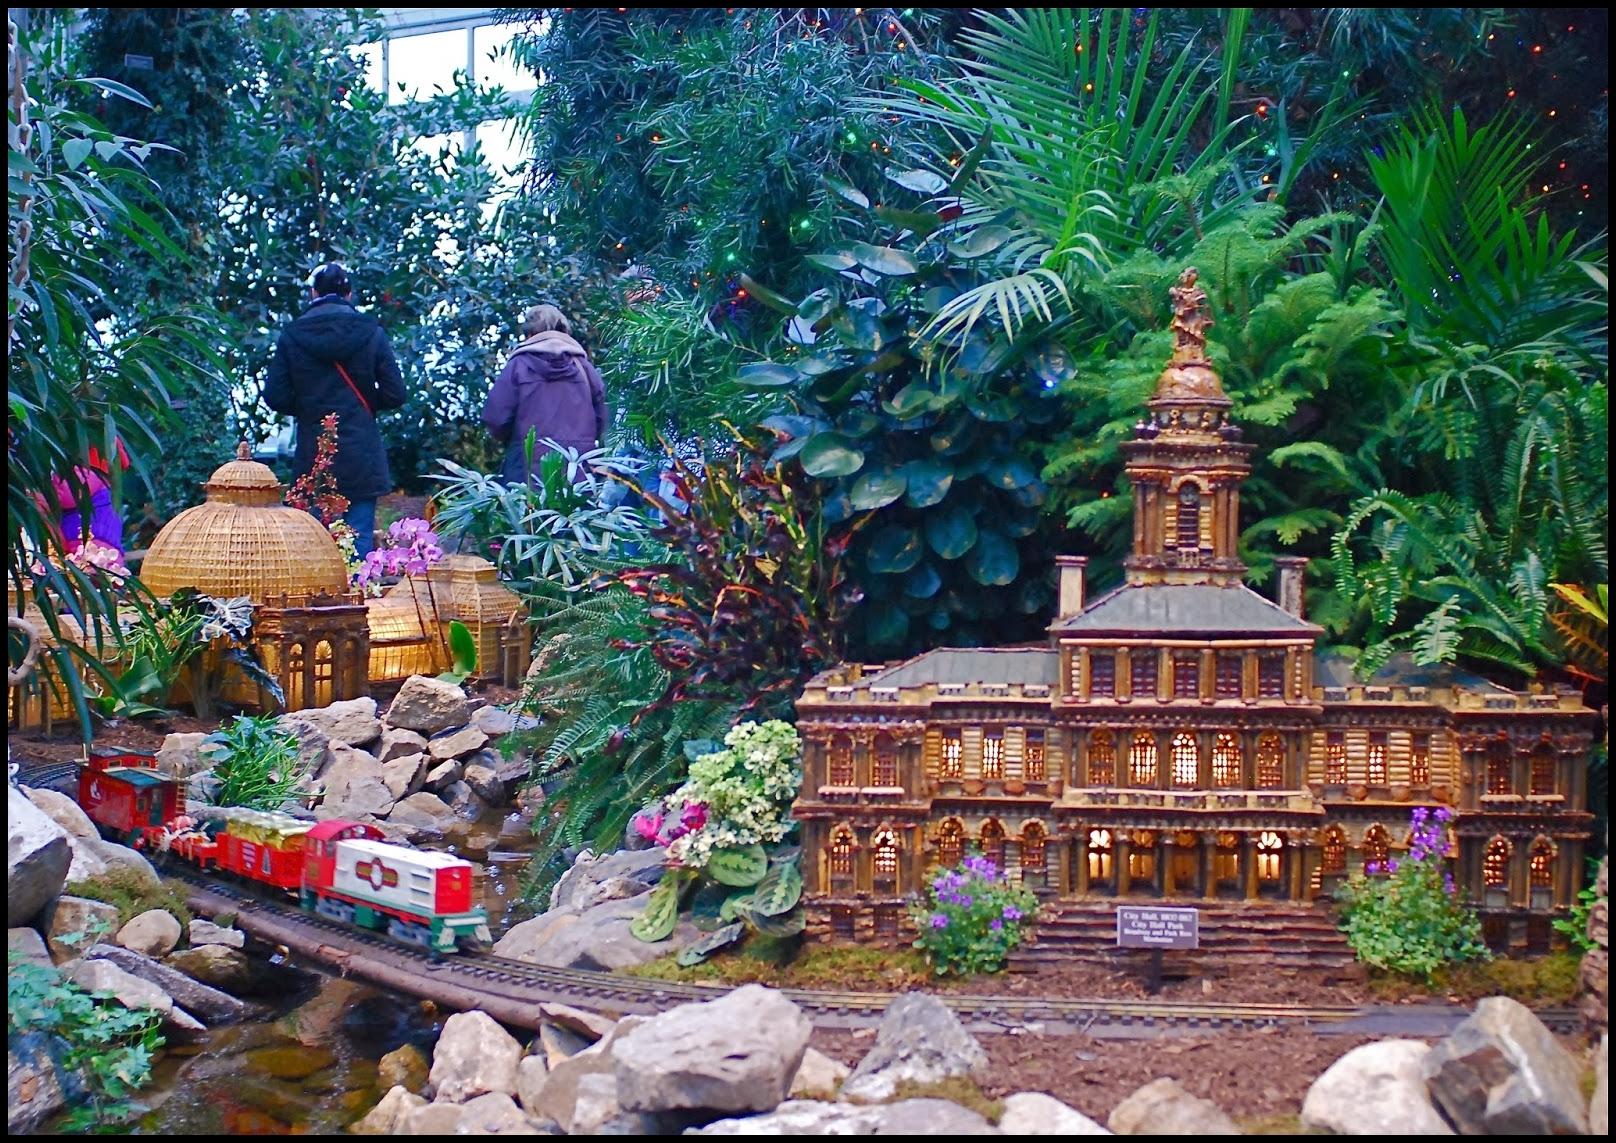 New York Botanical Garden S Holiday Train Show 2013 Historias De Nueva York